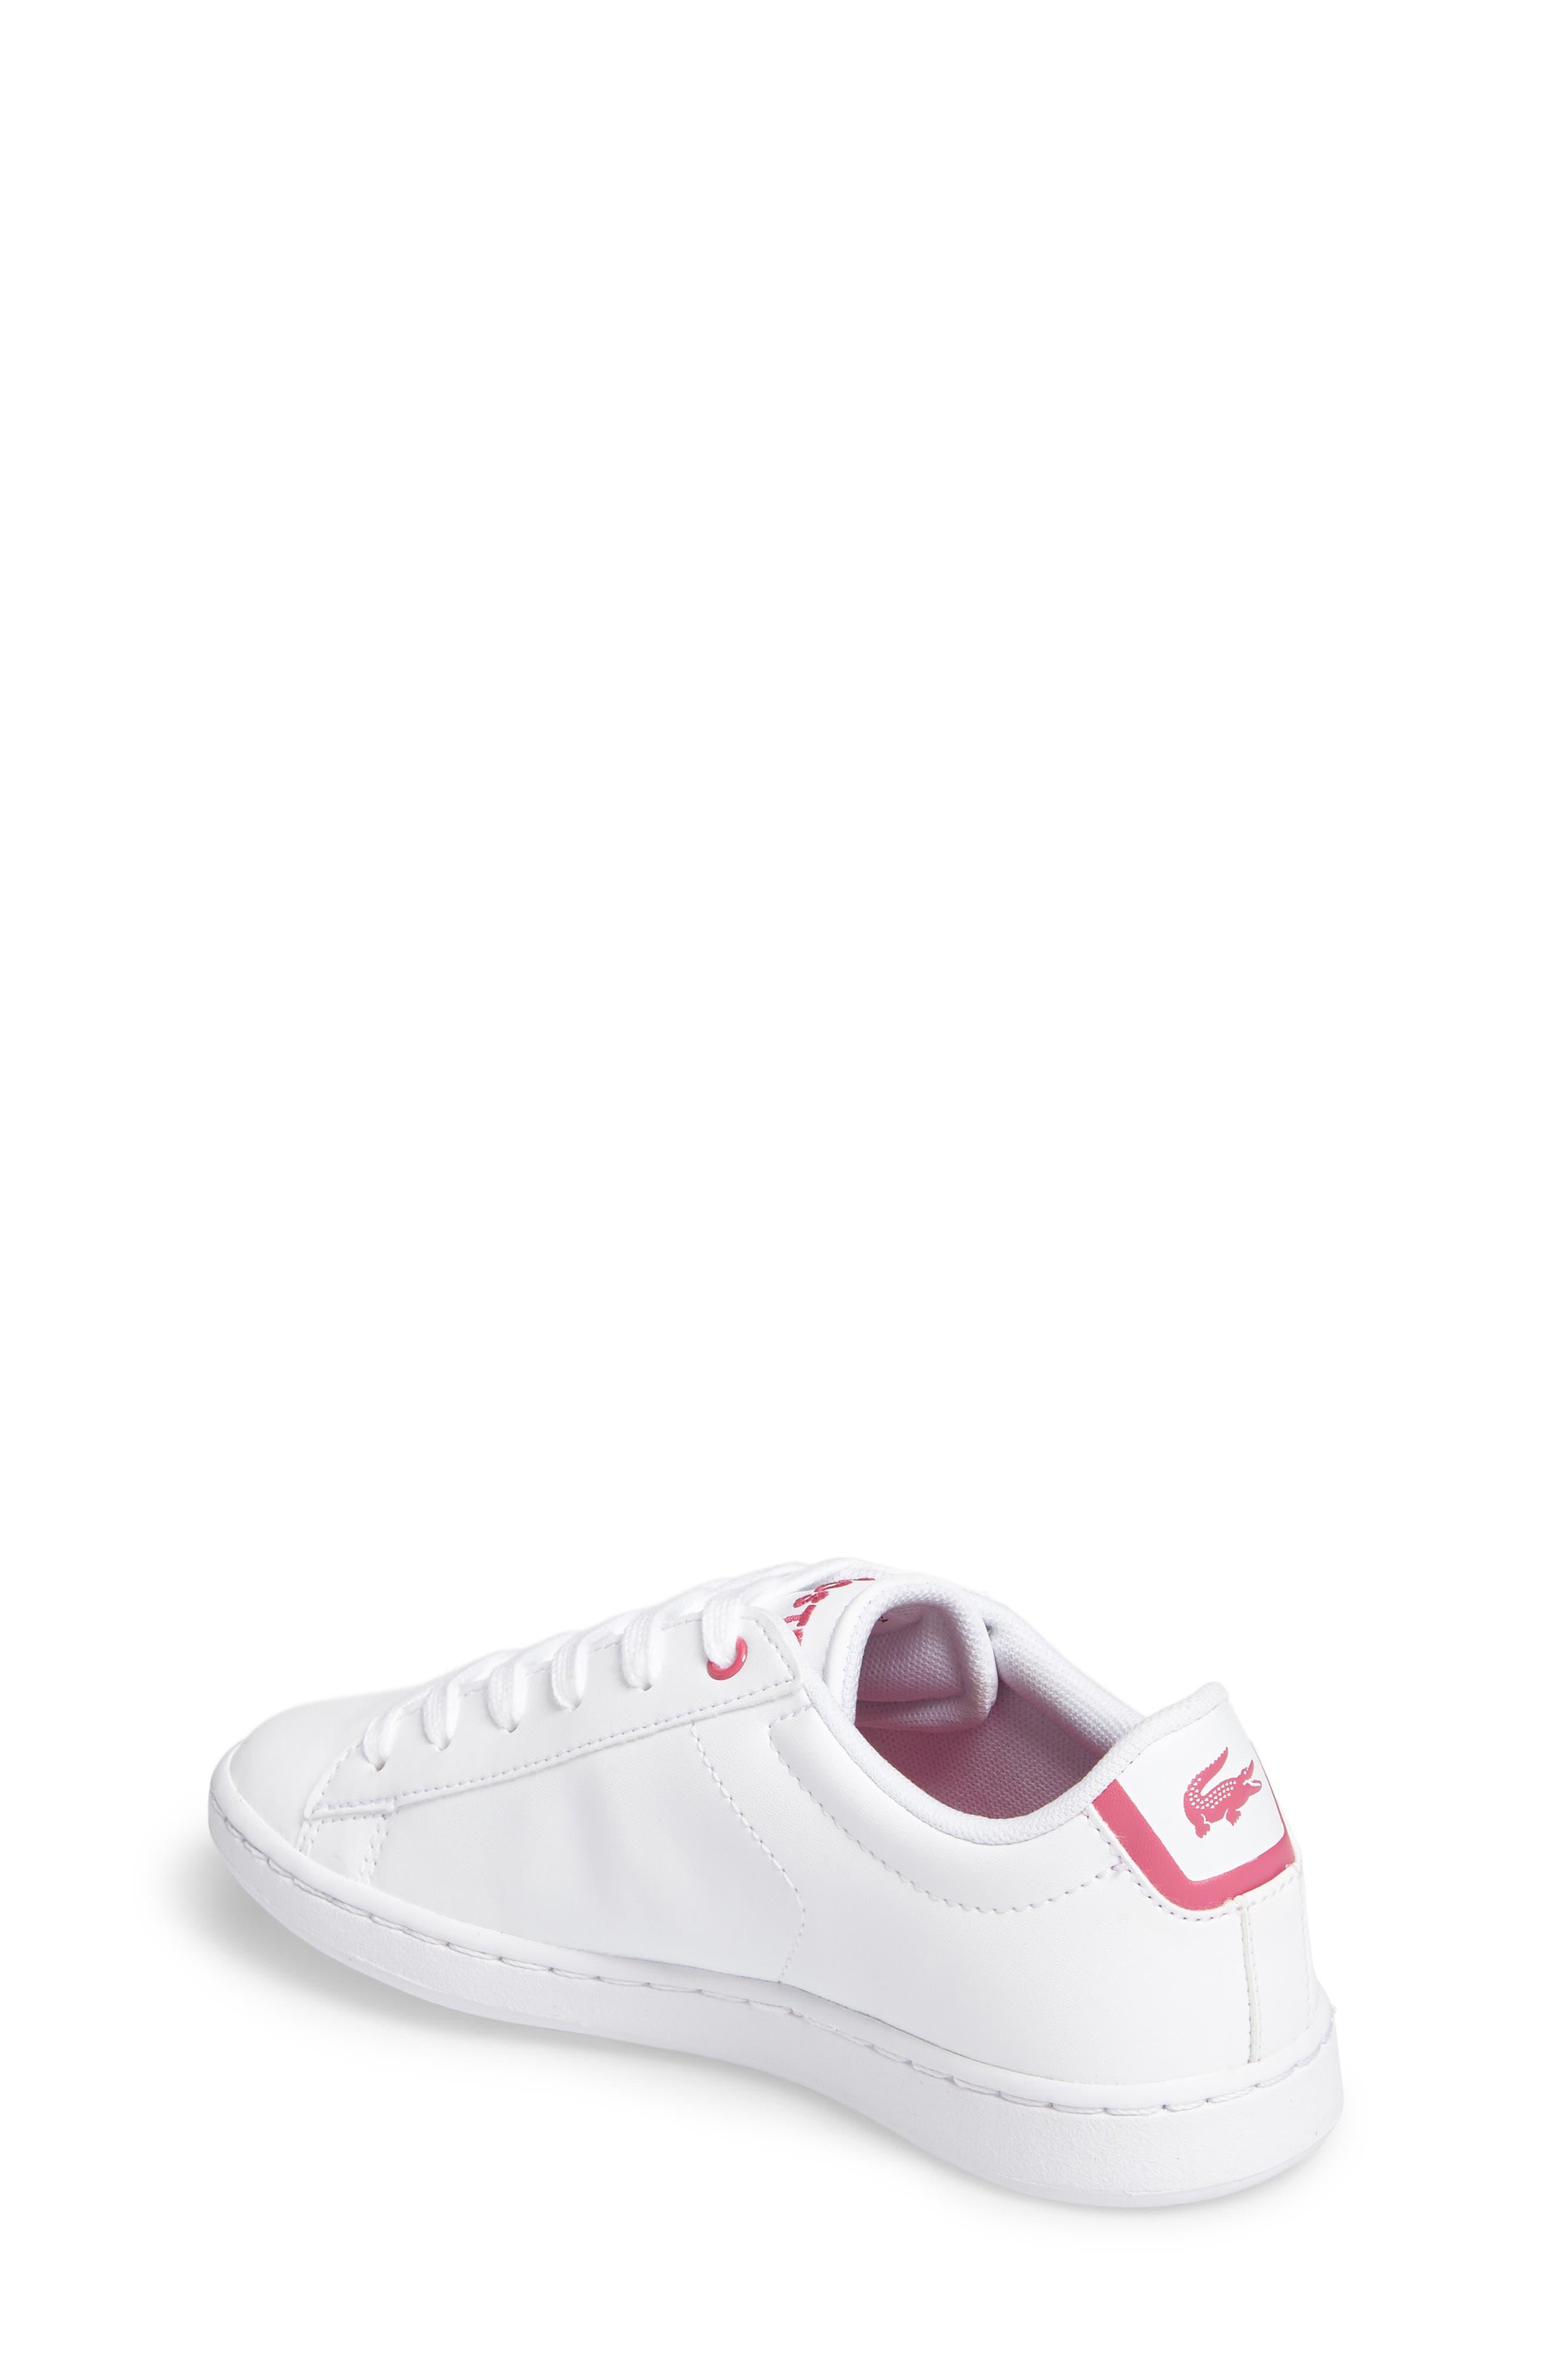 Carnaby EVO Sneaker,                             Alternate thumbnail 2, color,                             White/ Pink